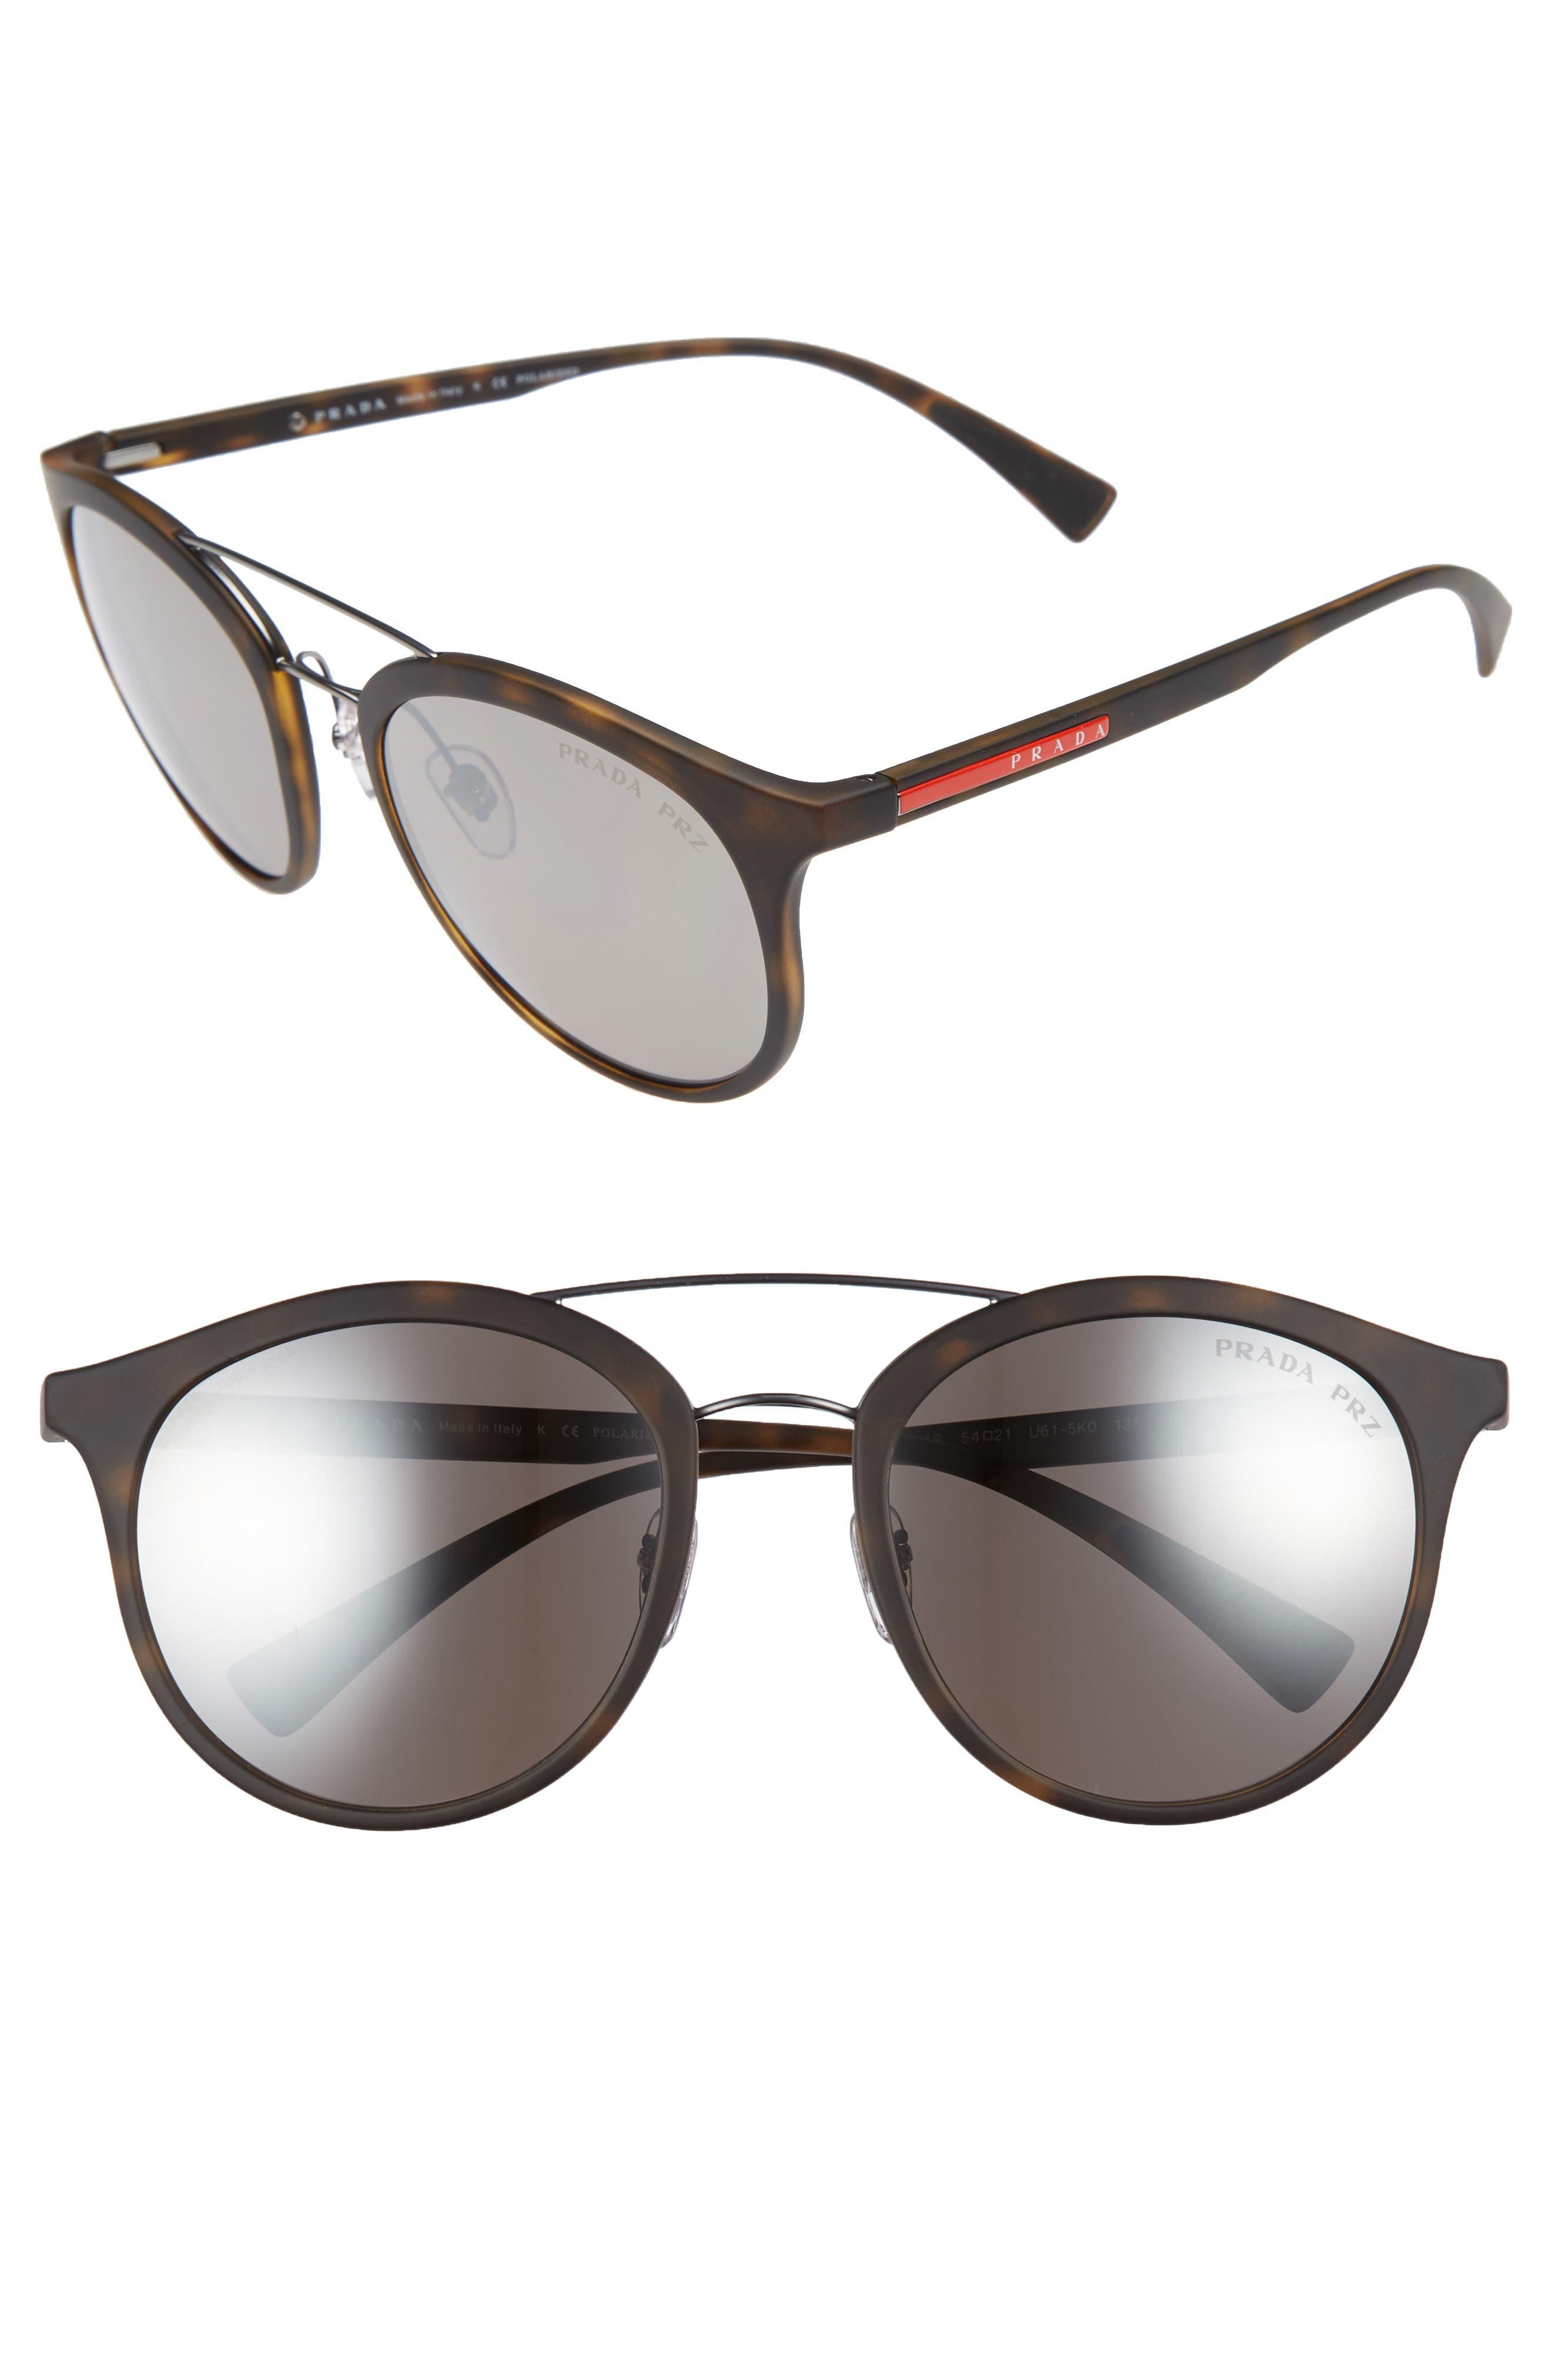 54mm Polarized Round Sunglasses,                         Main,                         color, Havana